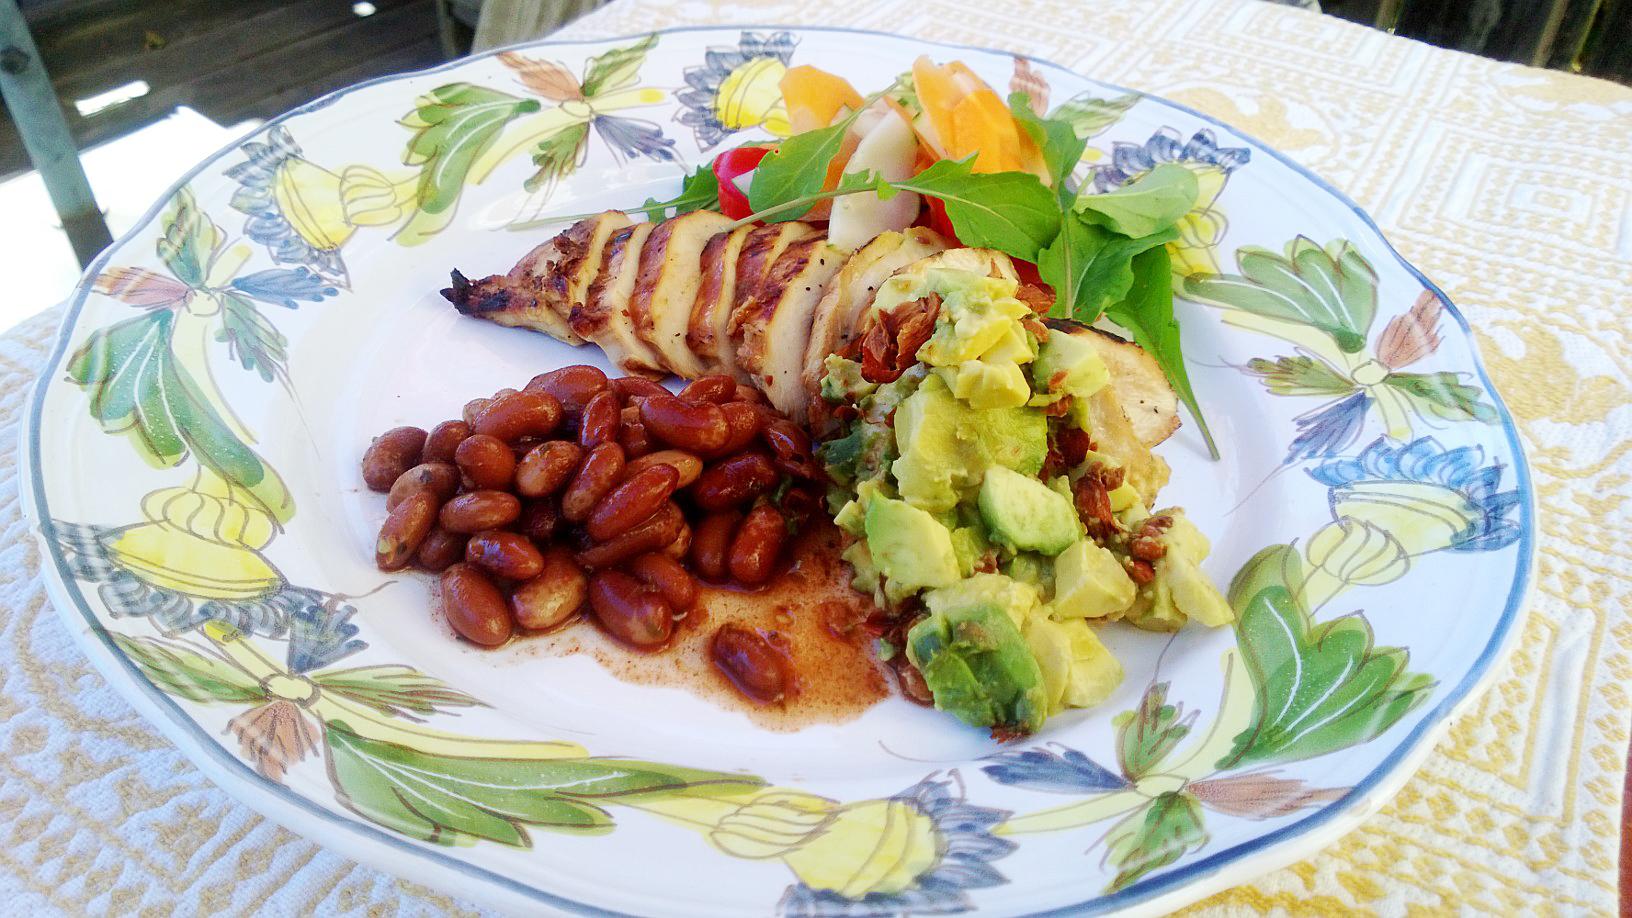 HOney Lime Chicken Meal Plate 2 adj